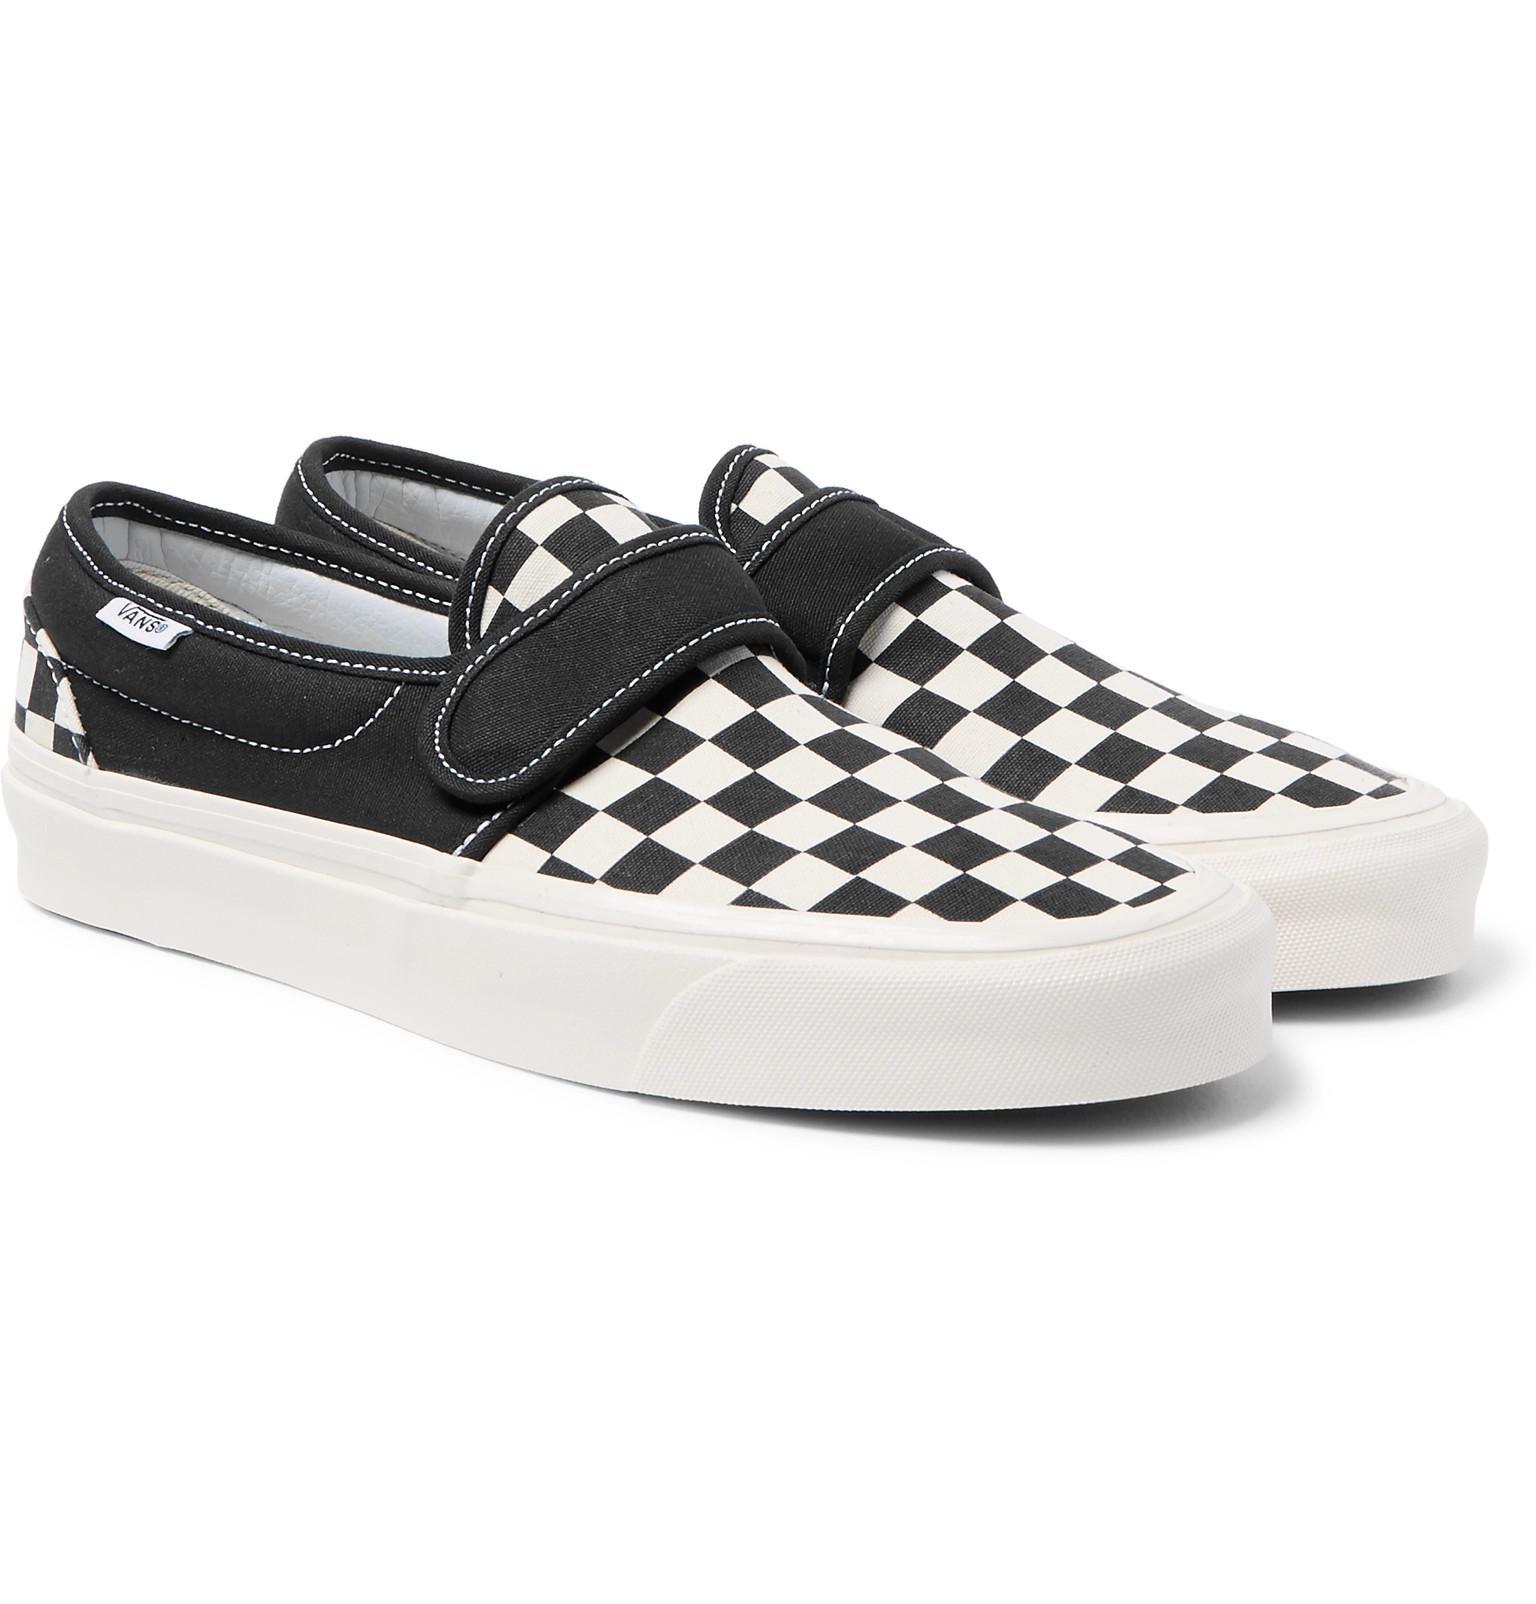 Vans Slip-on 47 V Dx Anaheim Factory Pack Sneakers in Black for Men ... a80ed6c9d